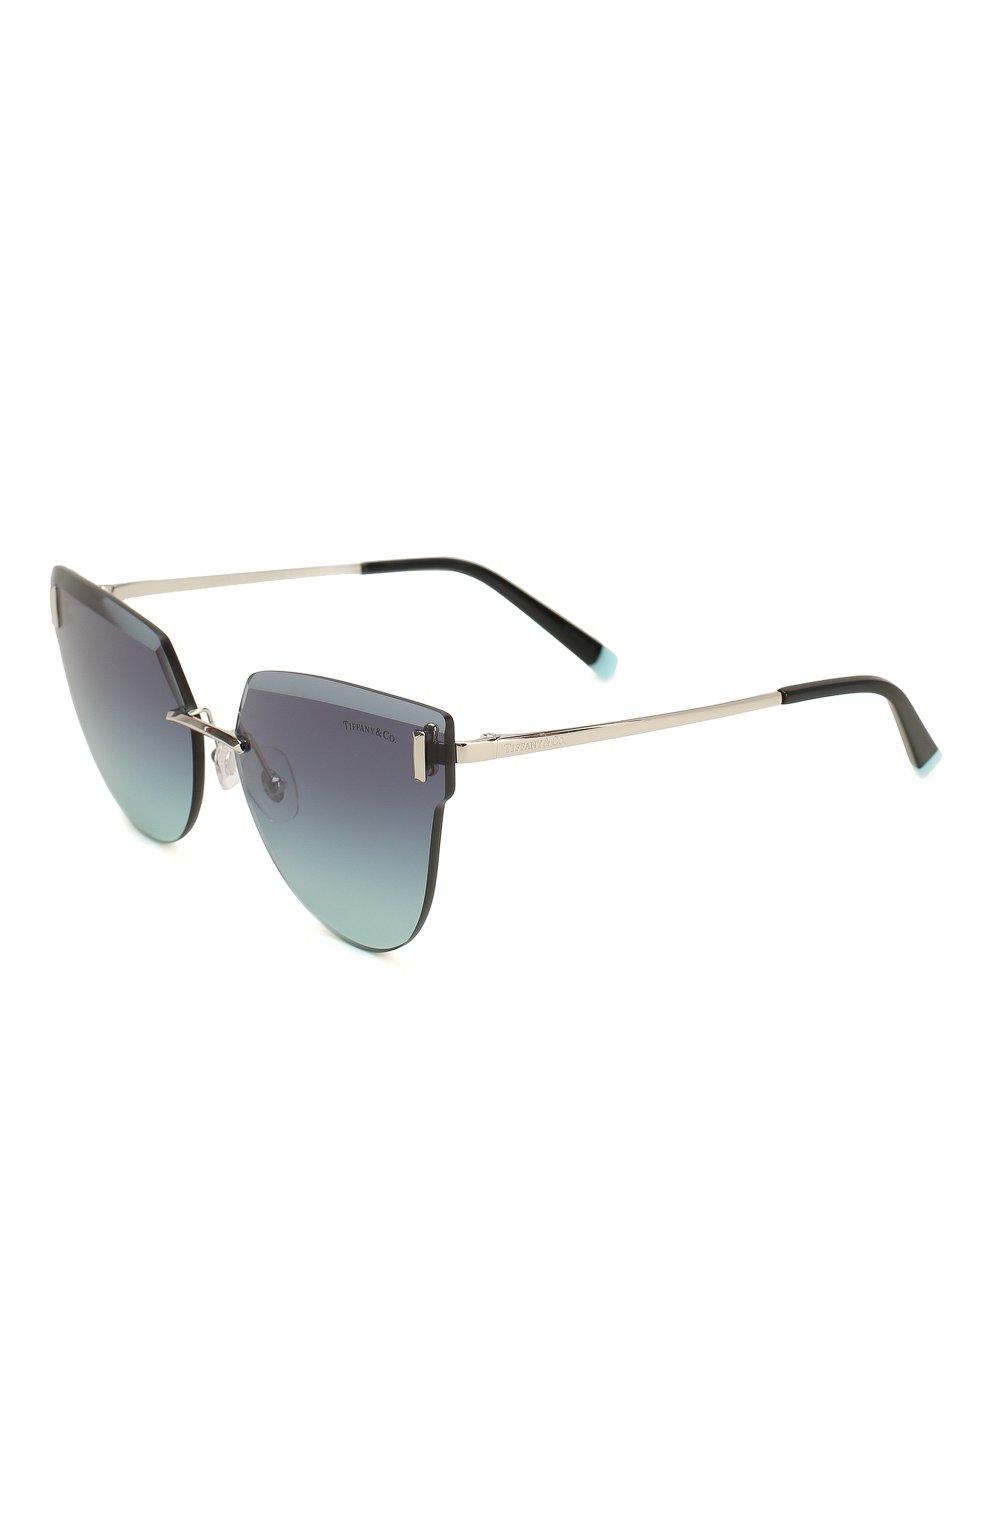 Женские солнцезащитные очки TIFFANY & CO. темно-синего цвета, арт. 3070-60019S | Фото 1